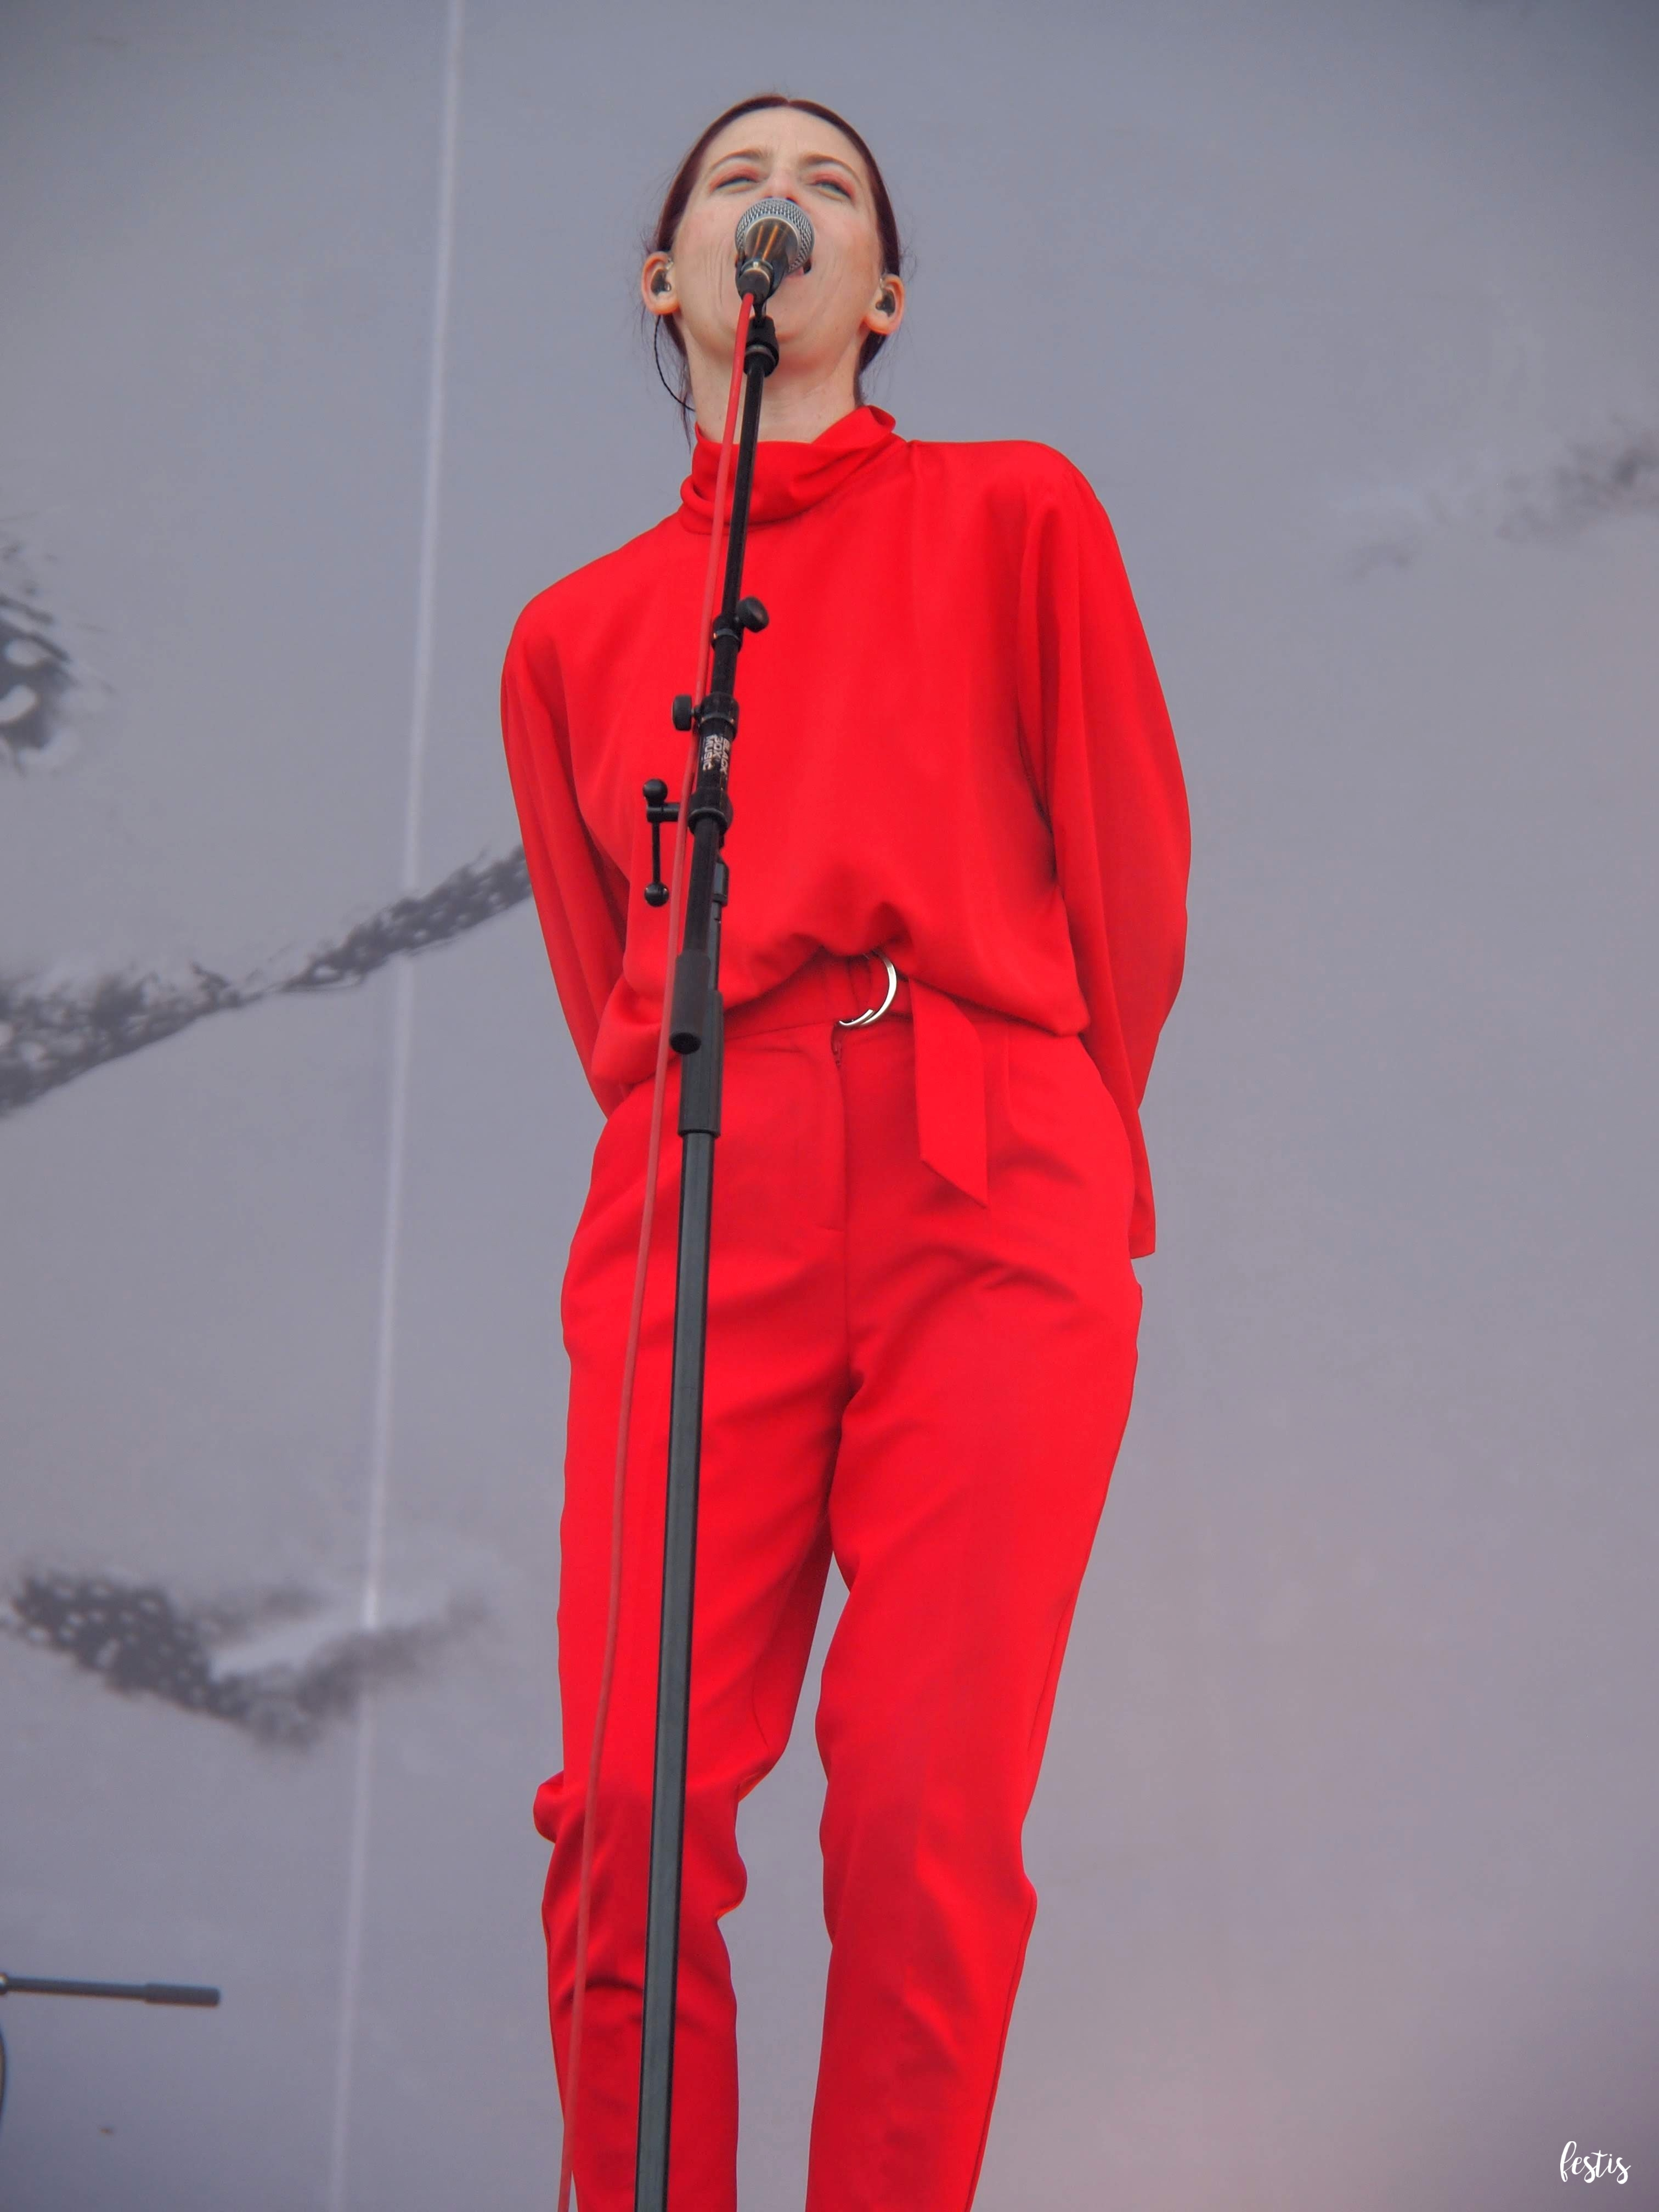 Kat Frankie, Lollapalooza Berlín 2018